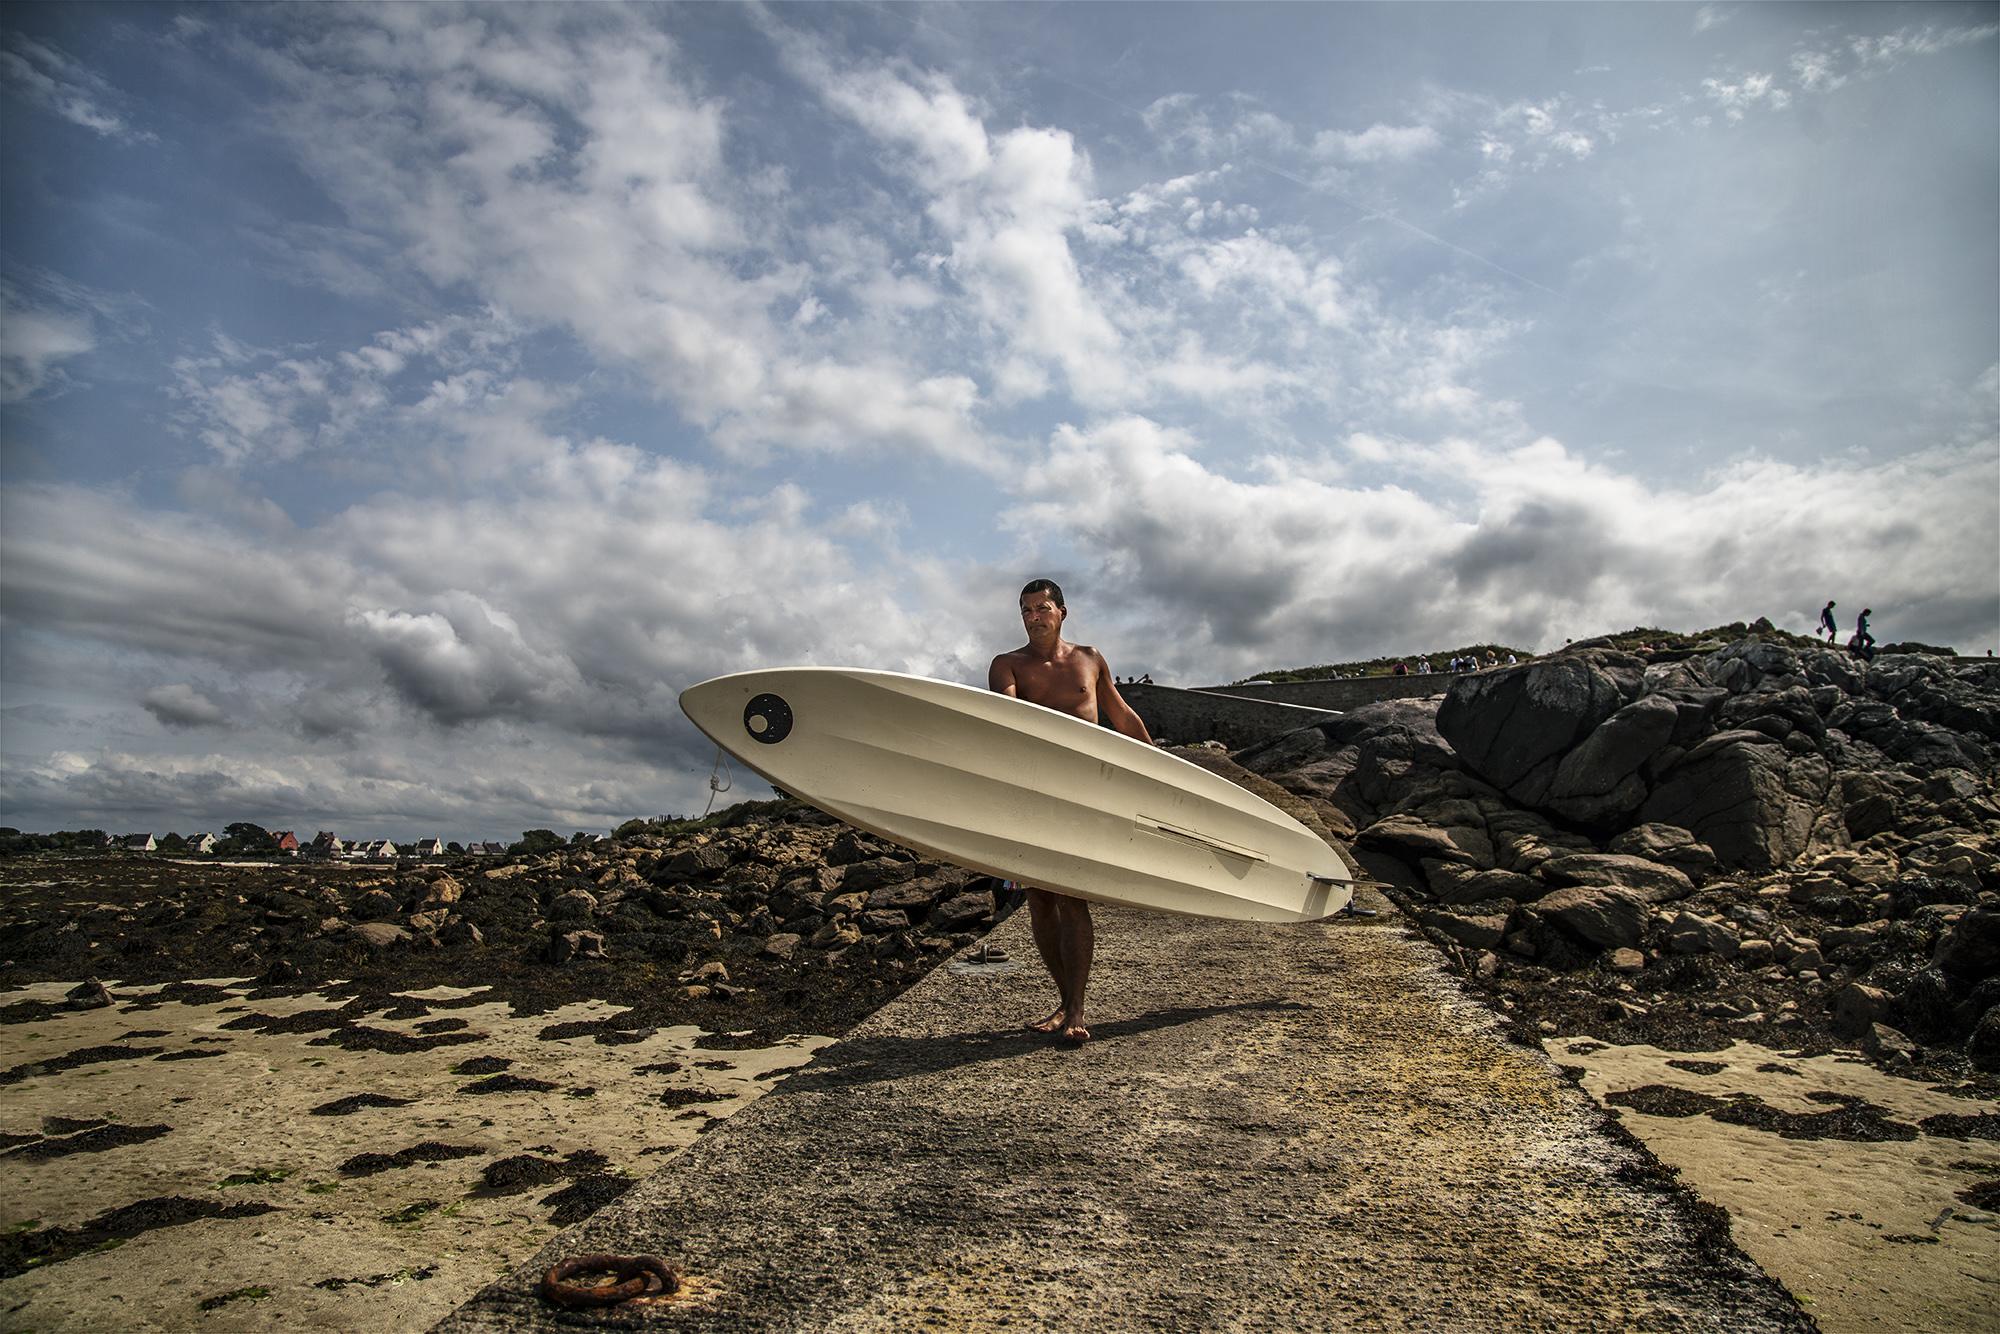 Brittany_2017_Surfboard_Man-005color.jpg